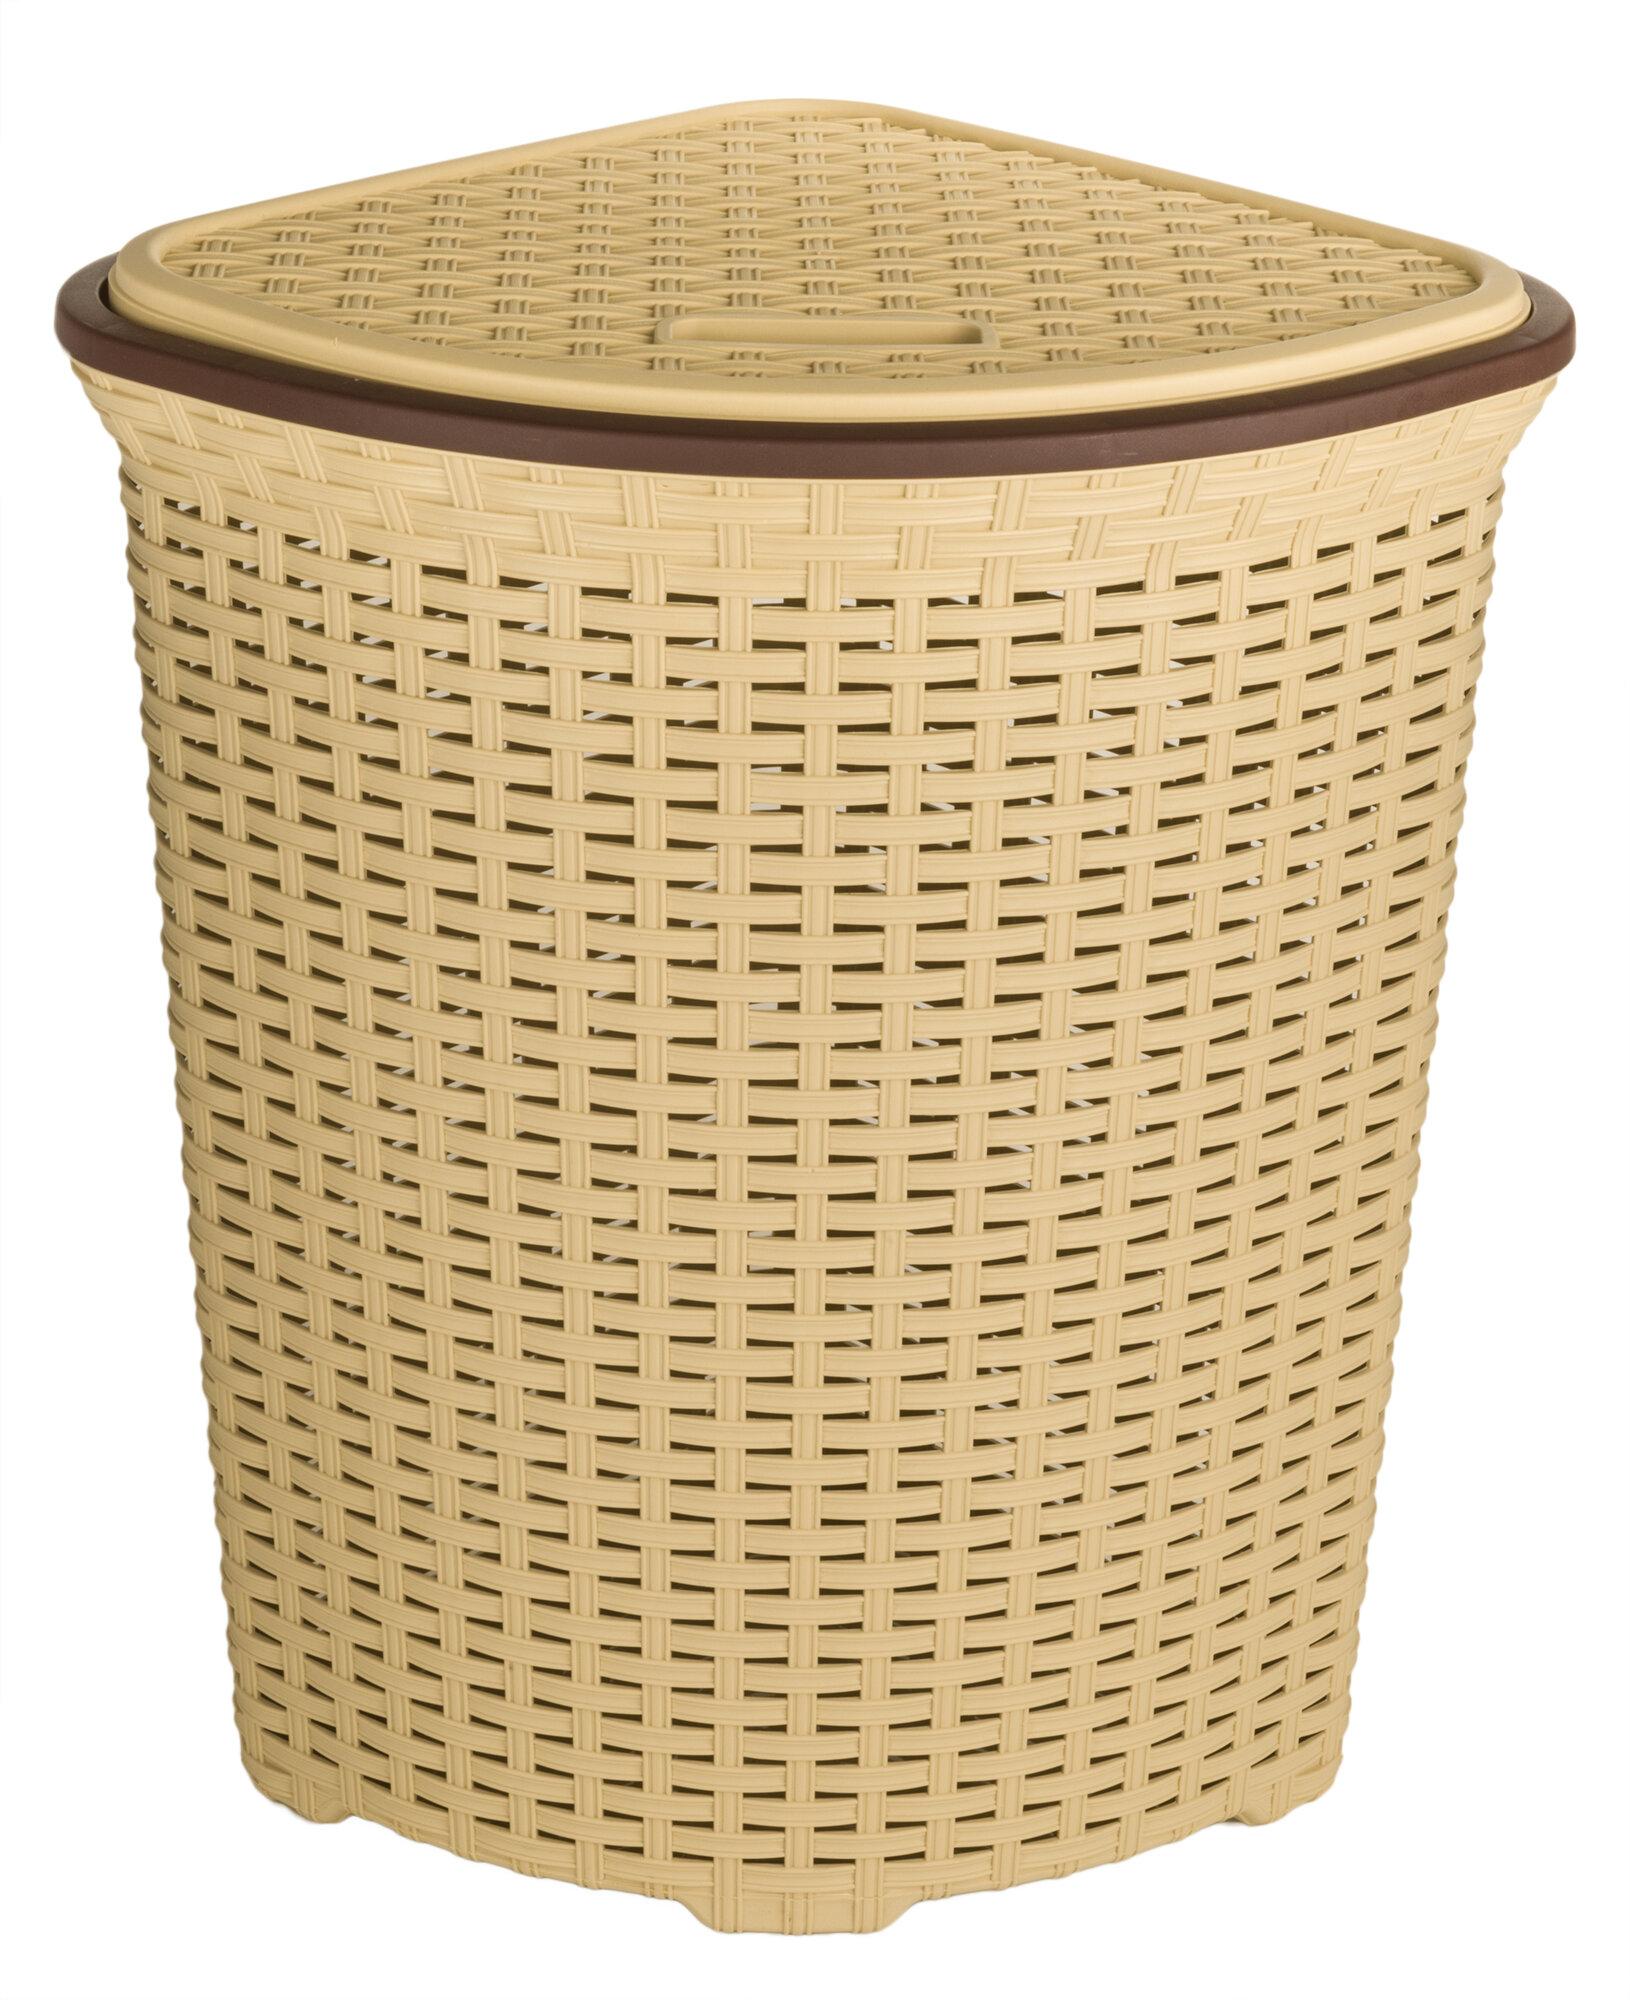 Superior performance superio brand wicker laundry hamper ebay - Cane laundry hamper ...